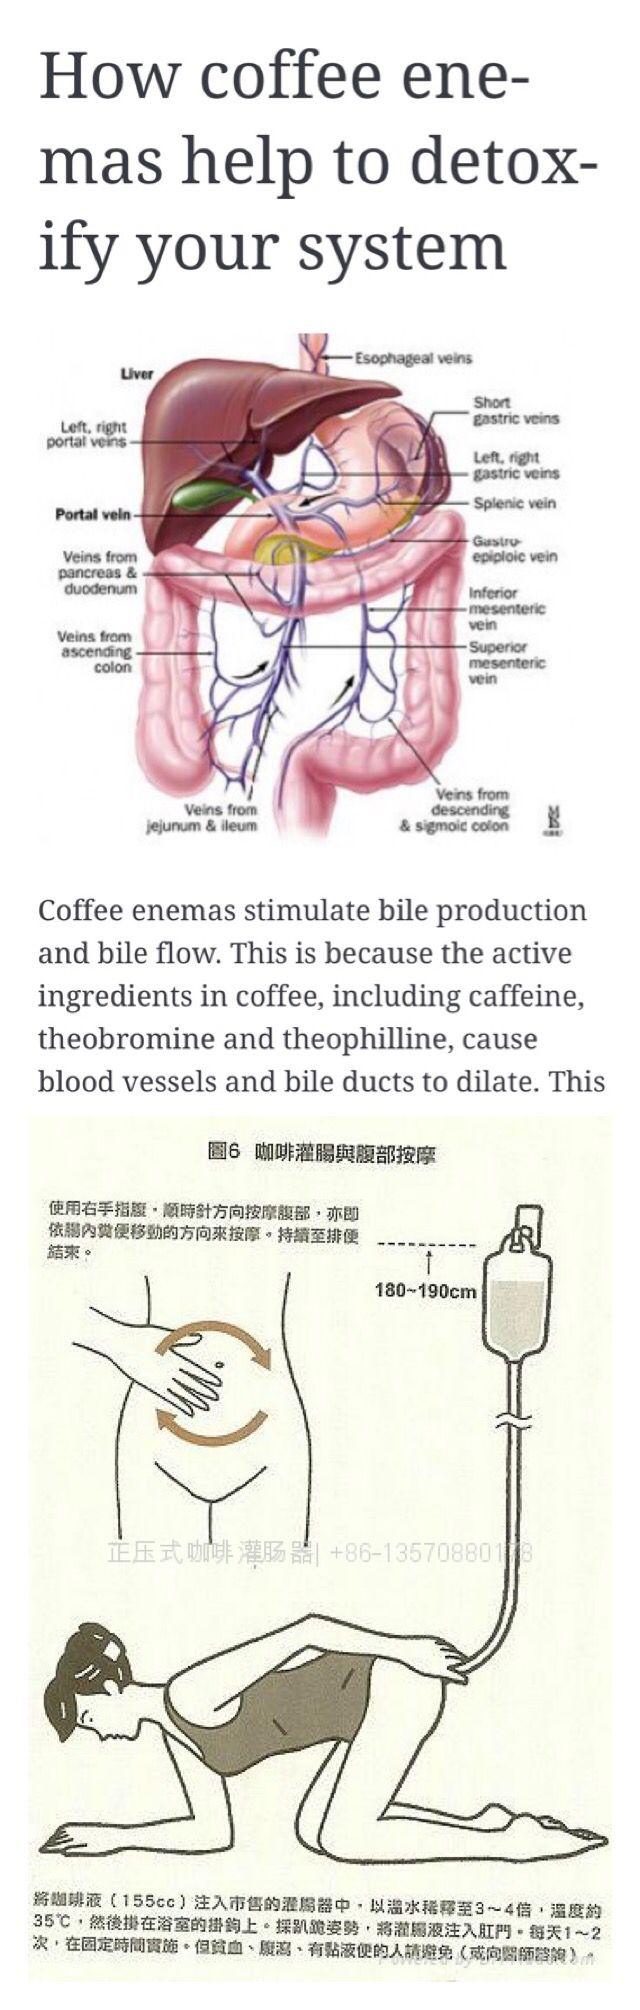 Detoxify your liver with coffee enemas